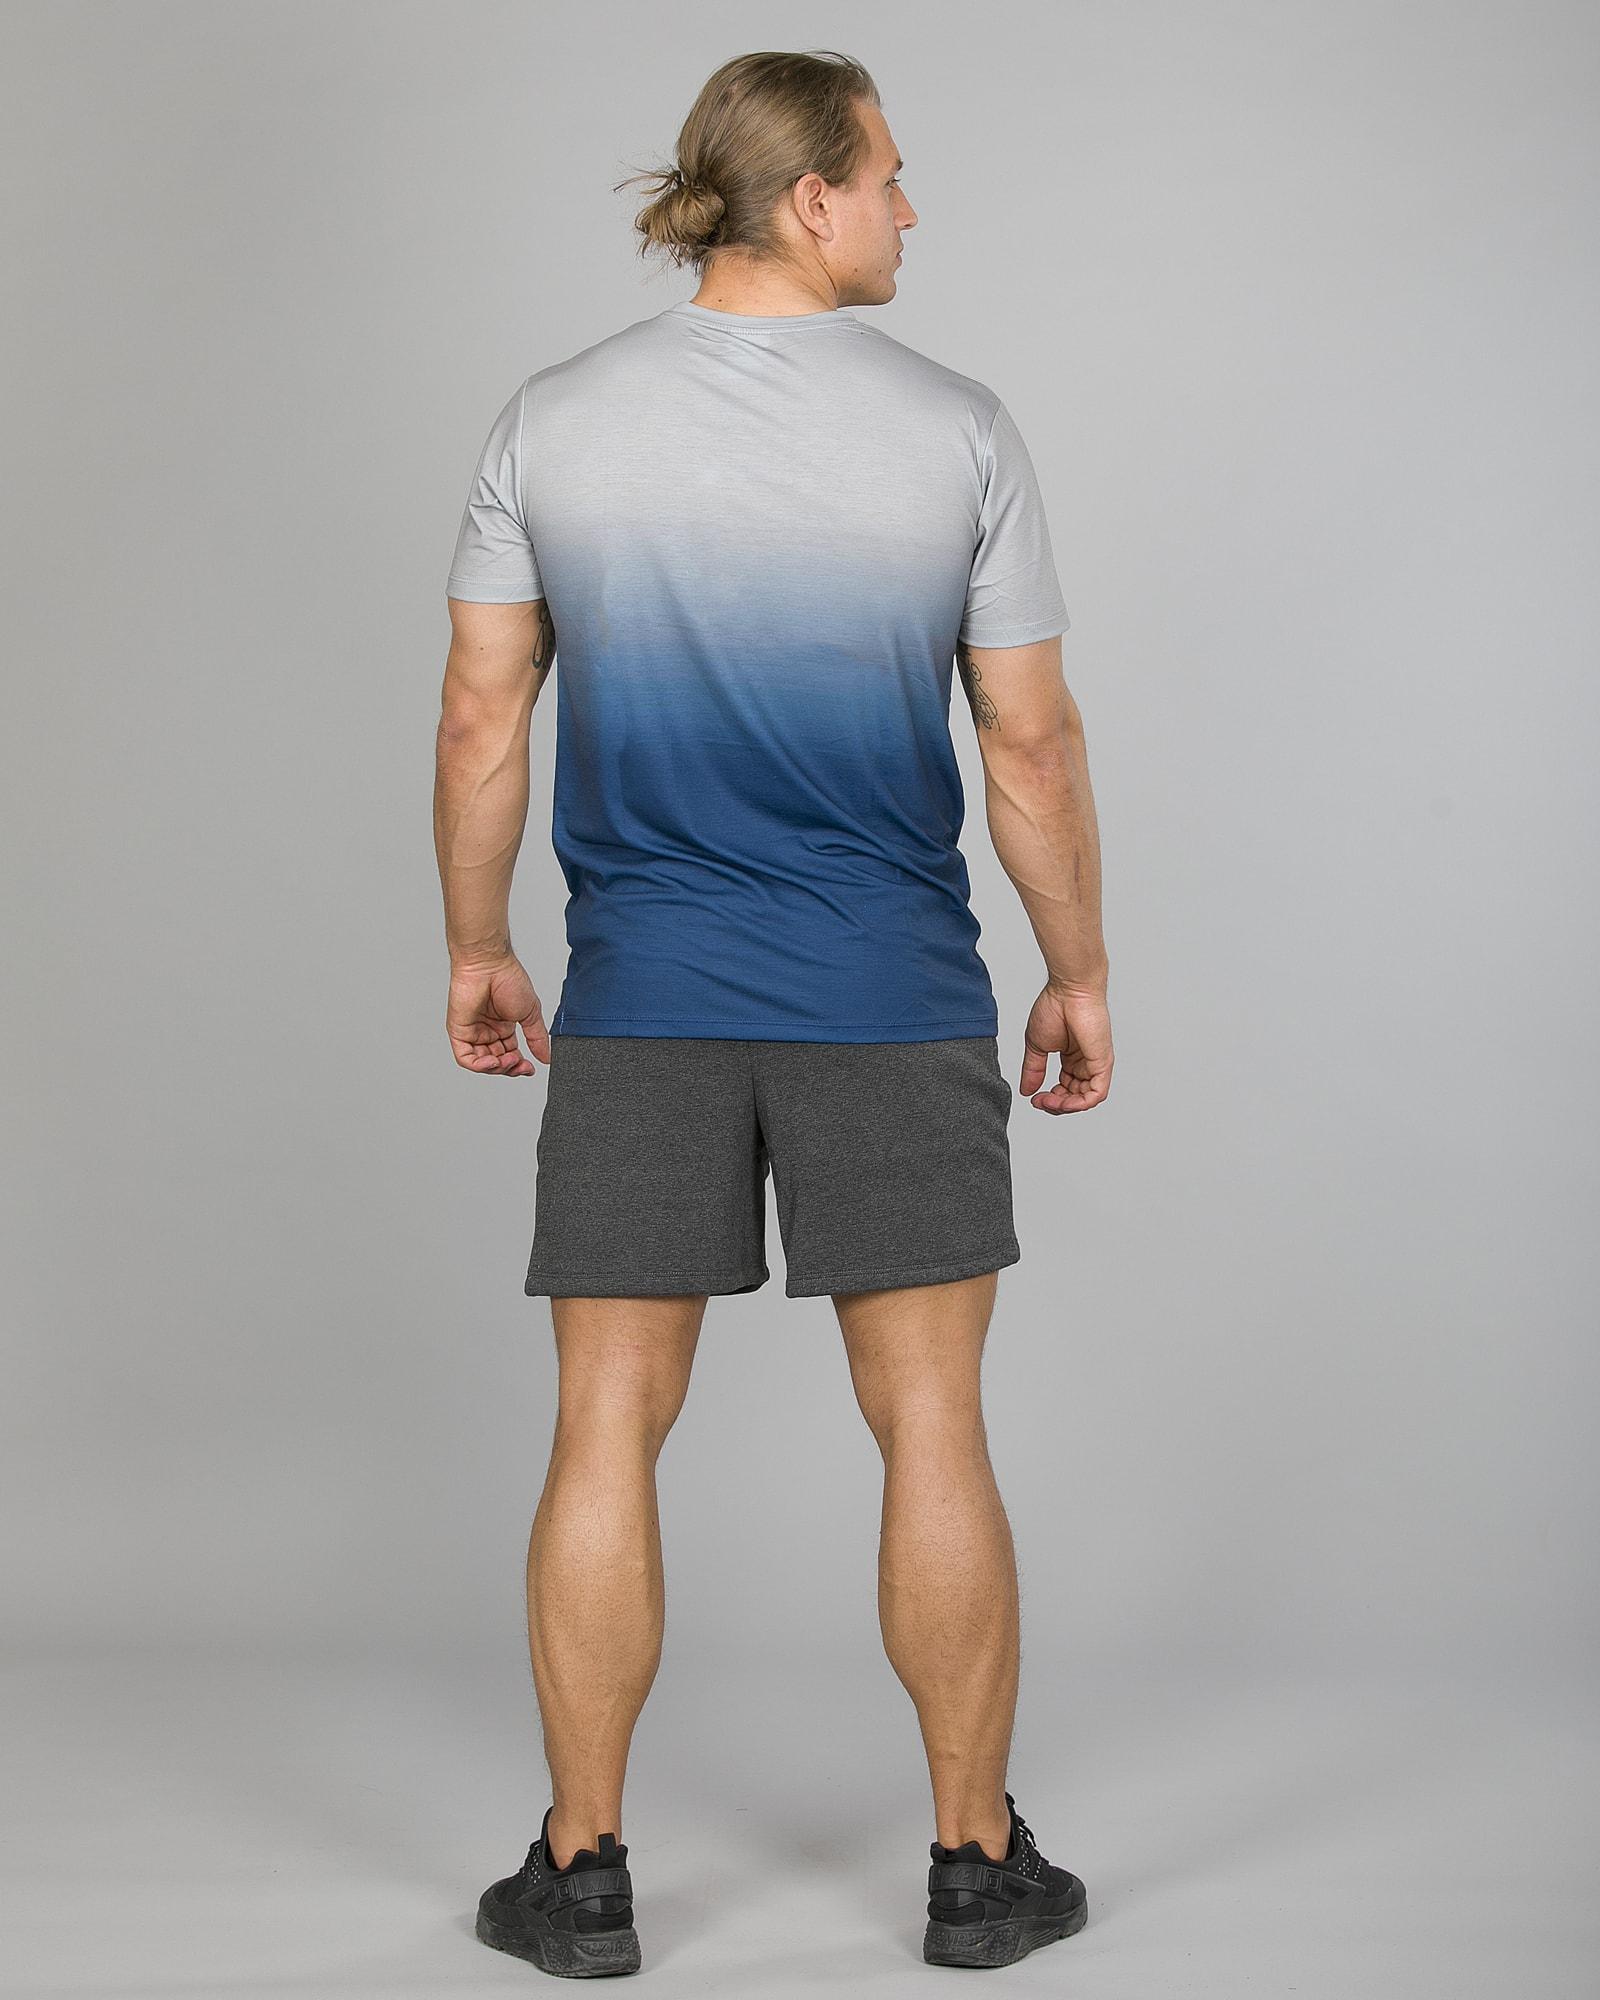 Hype Midnight Fade T-Shirt Men ss18210b Blue:Grey and Badge Shorts Men tm2ndrp16 Charcoal c